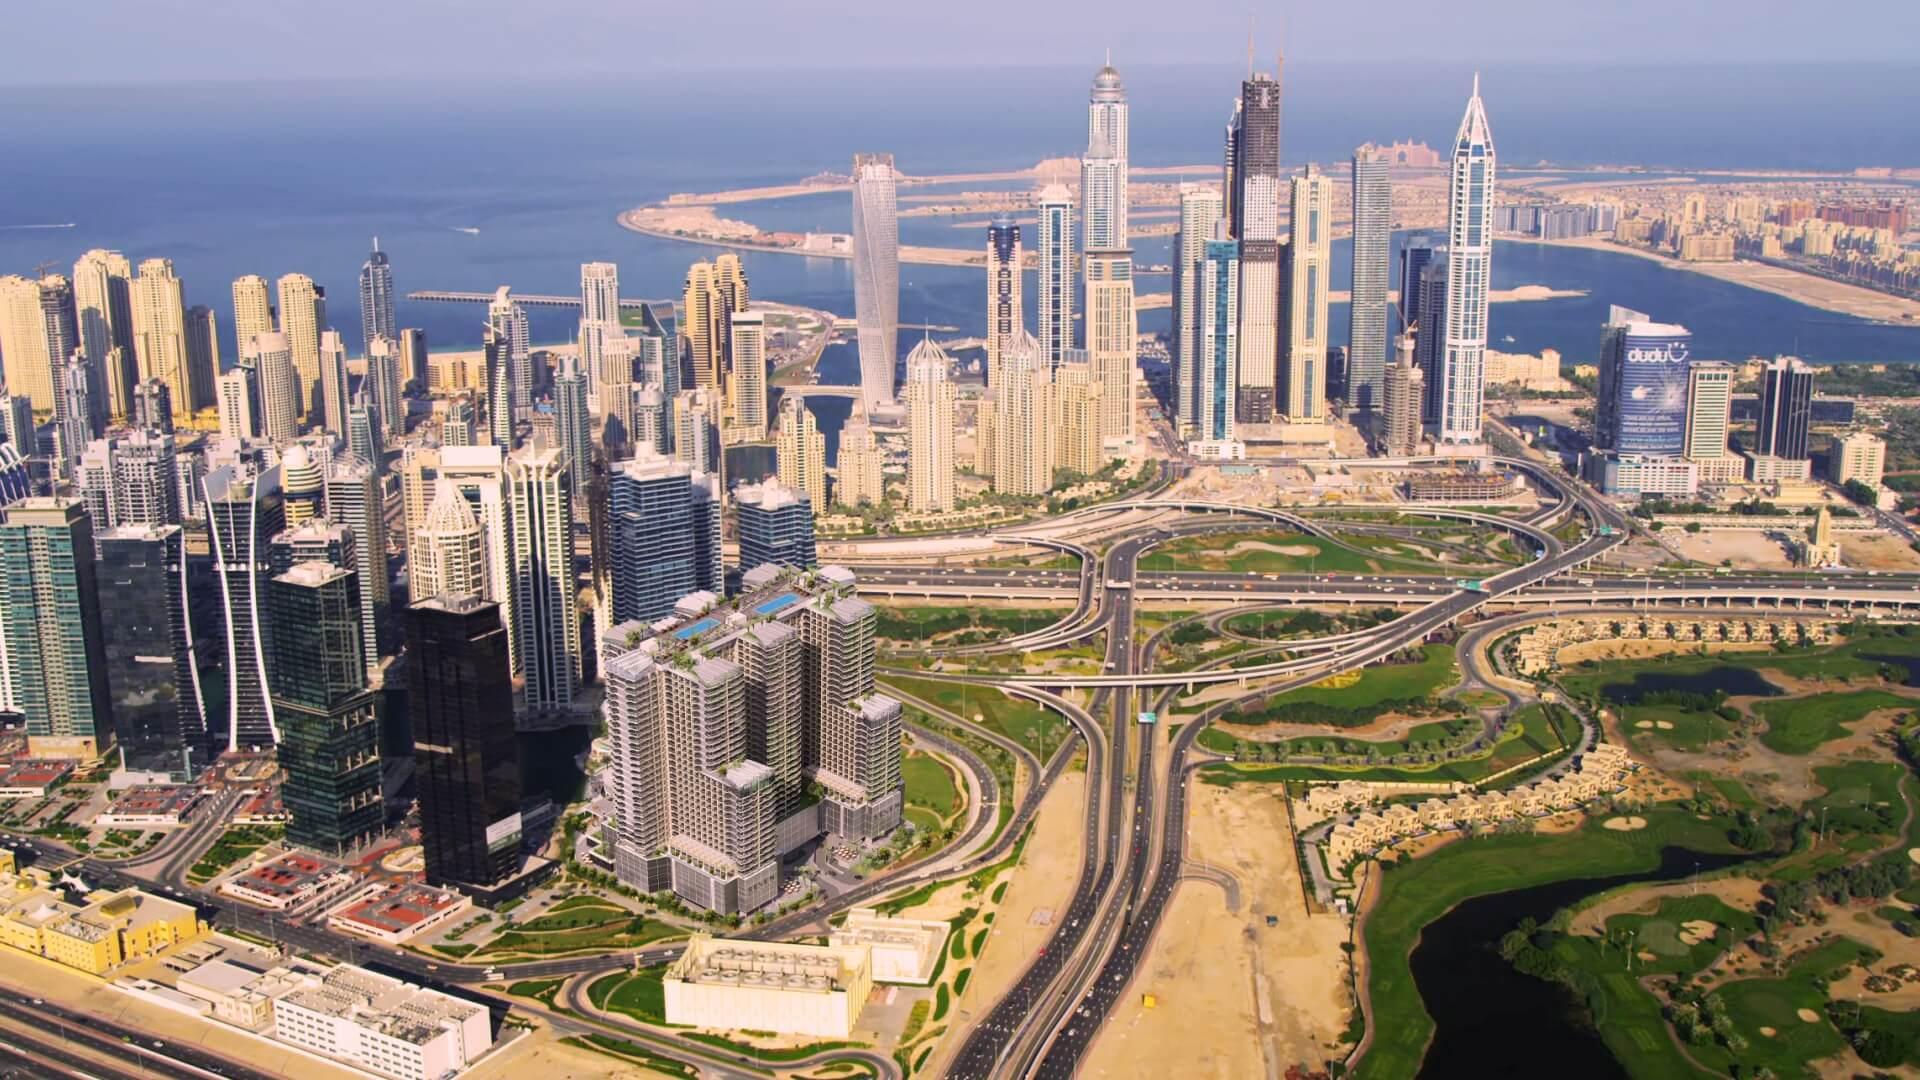 GOLF VIEWS SEVEN CITY, Jumeirah Lake Towers, Dubai, UAE – photo 7